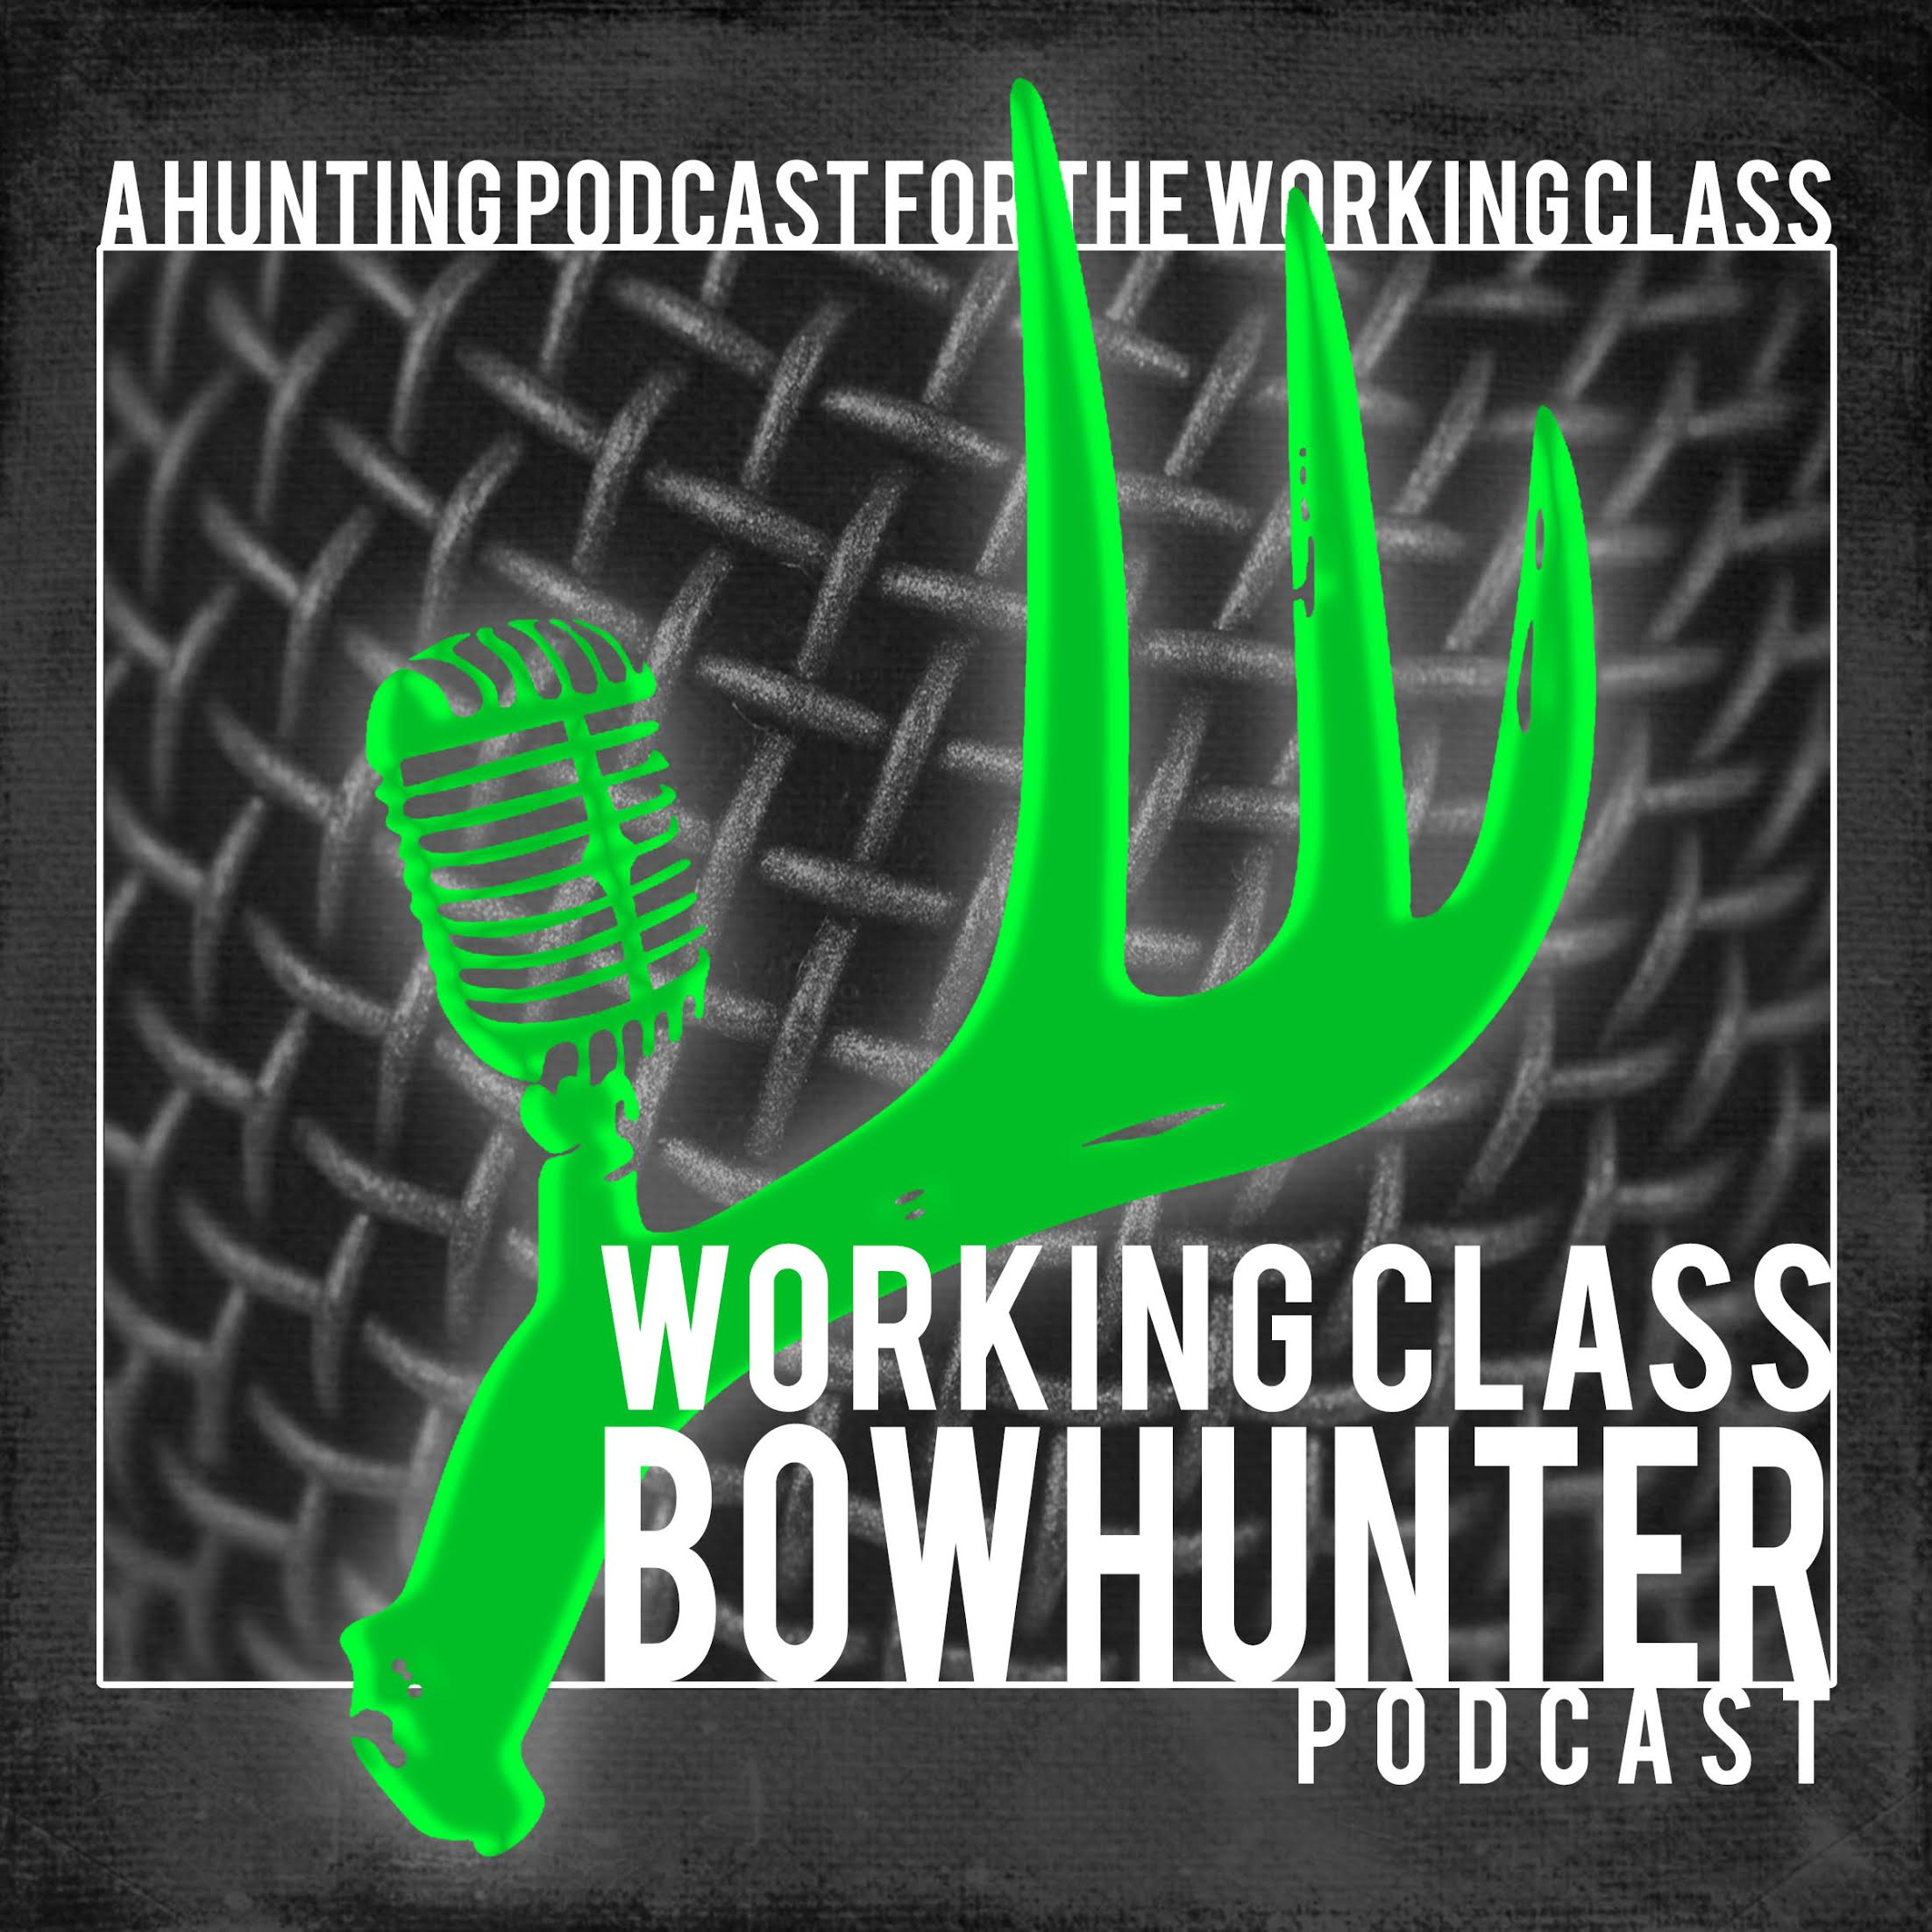 Working Class Bowhunter show art